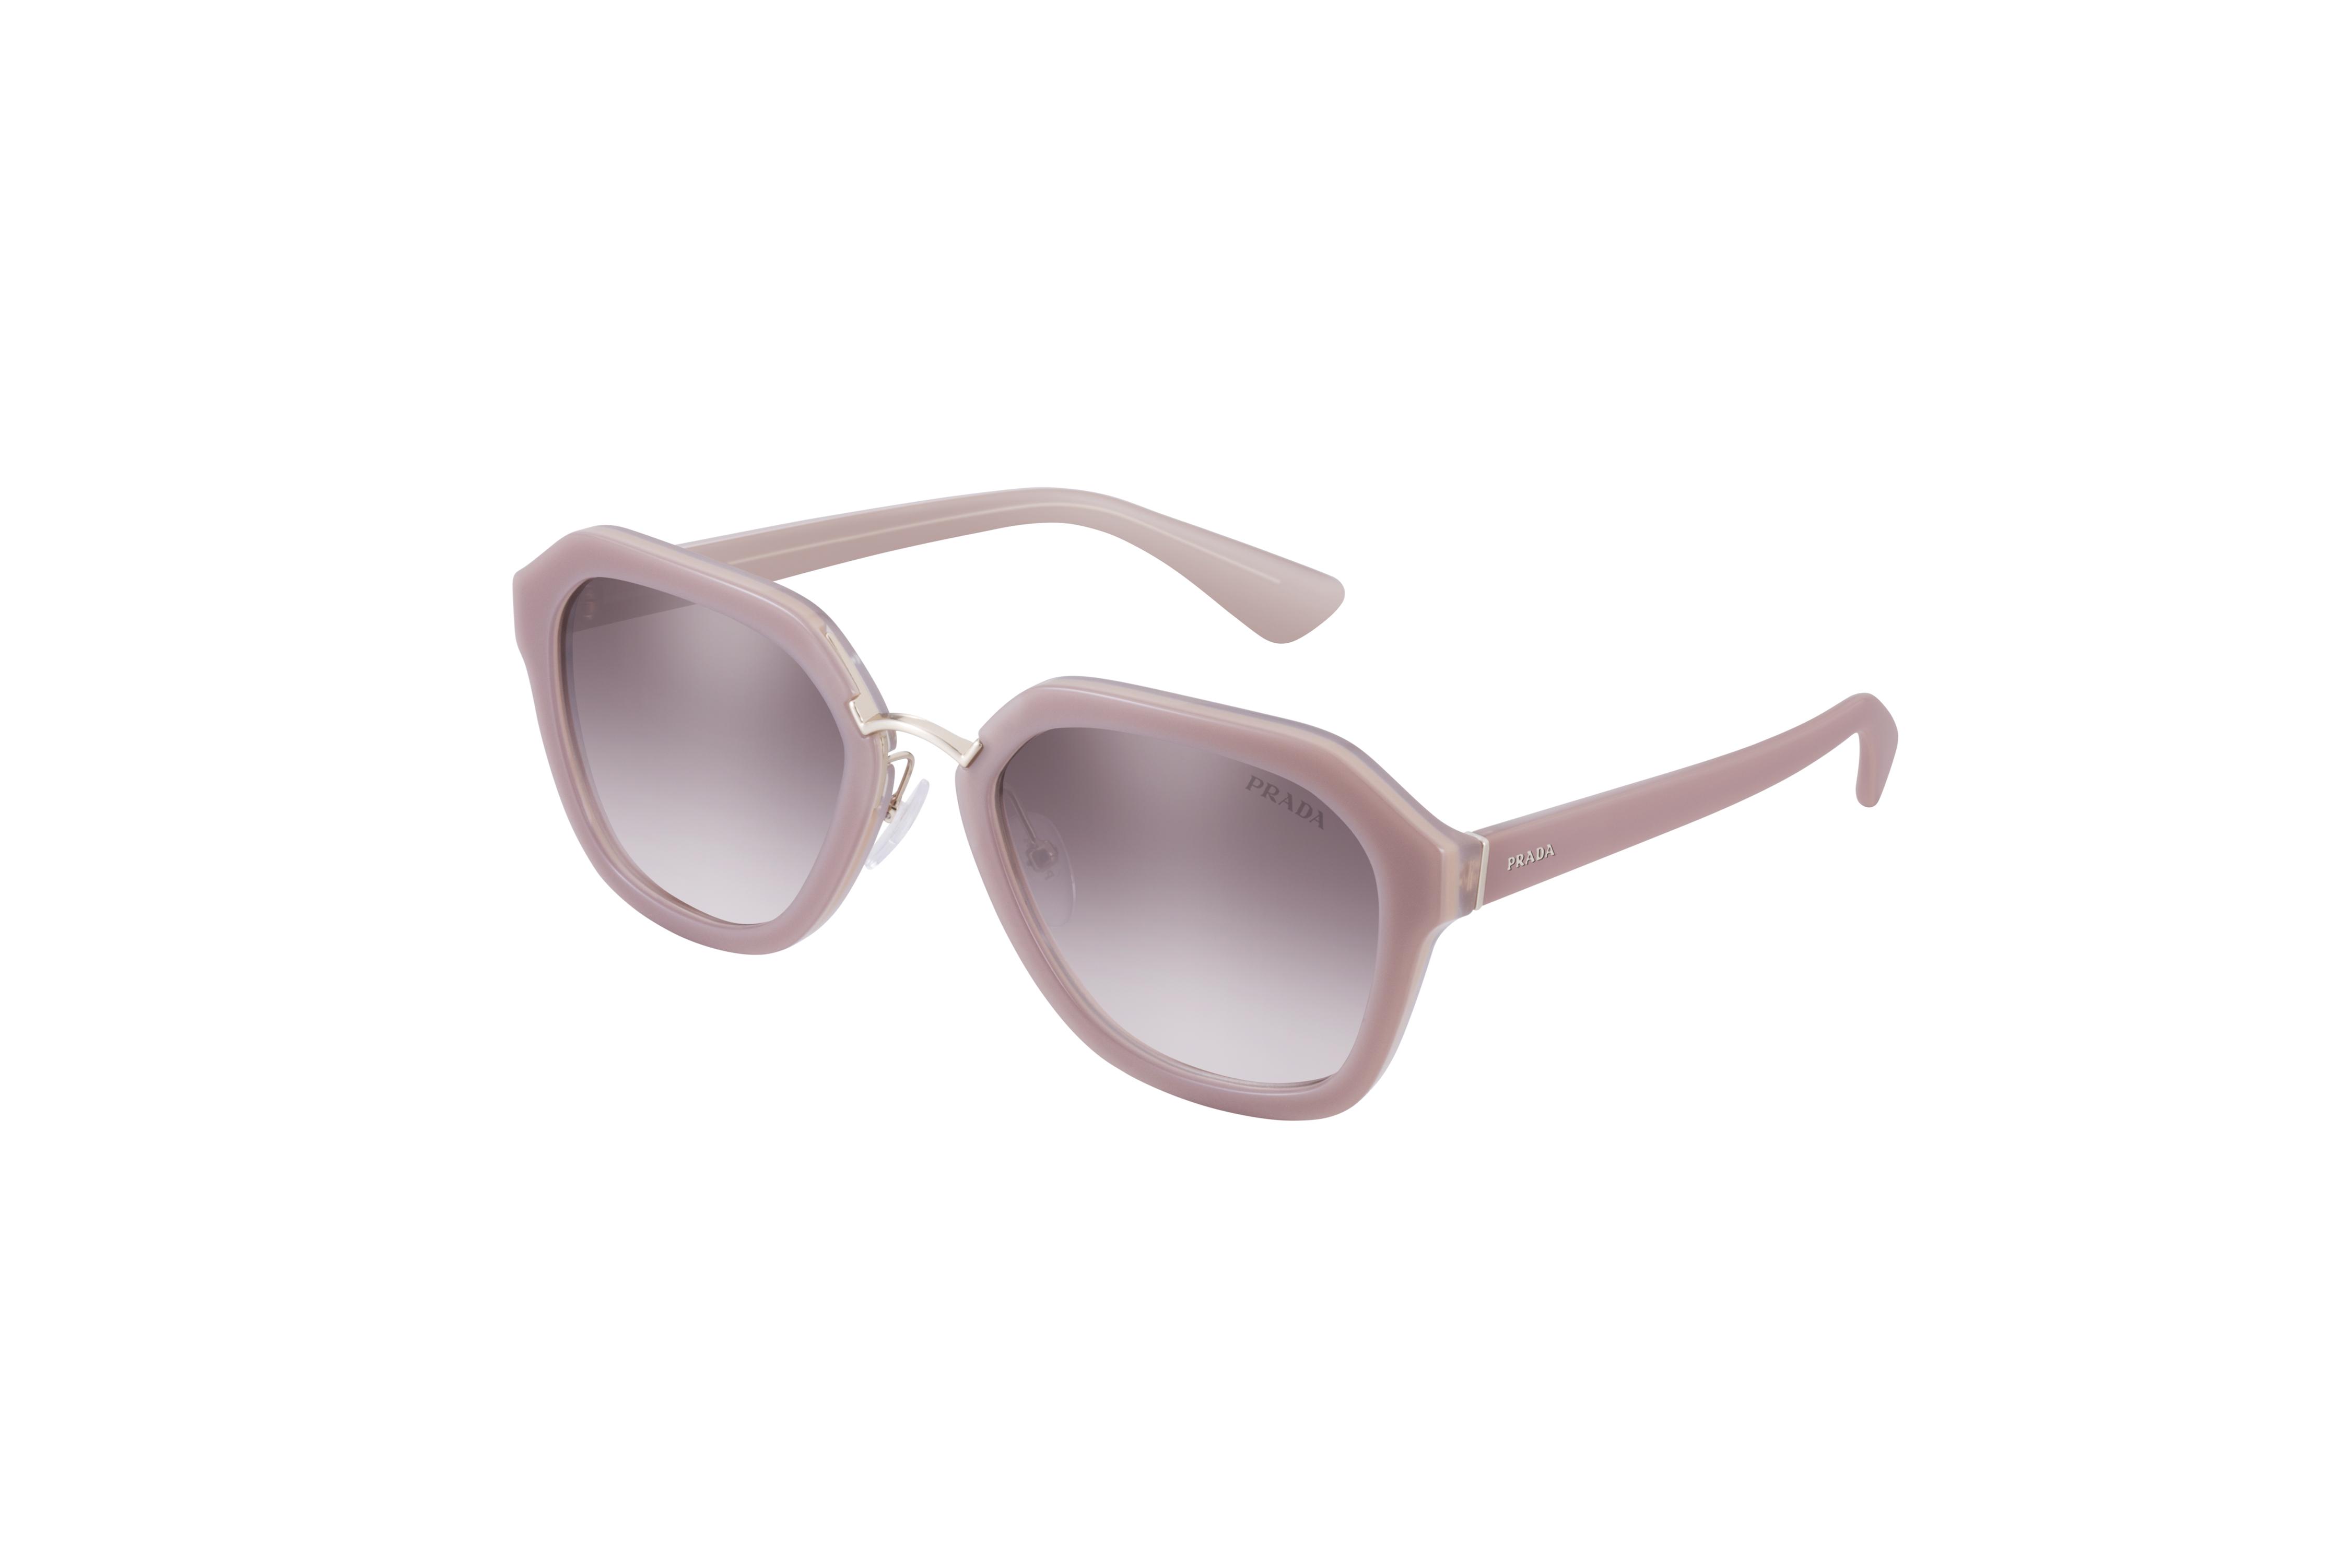 prada nylon messenger bag red - Spring/Summer 2015 Prada Eyewear Collection | Identity Magazine